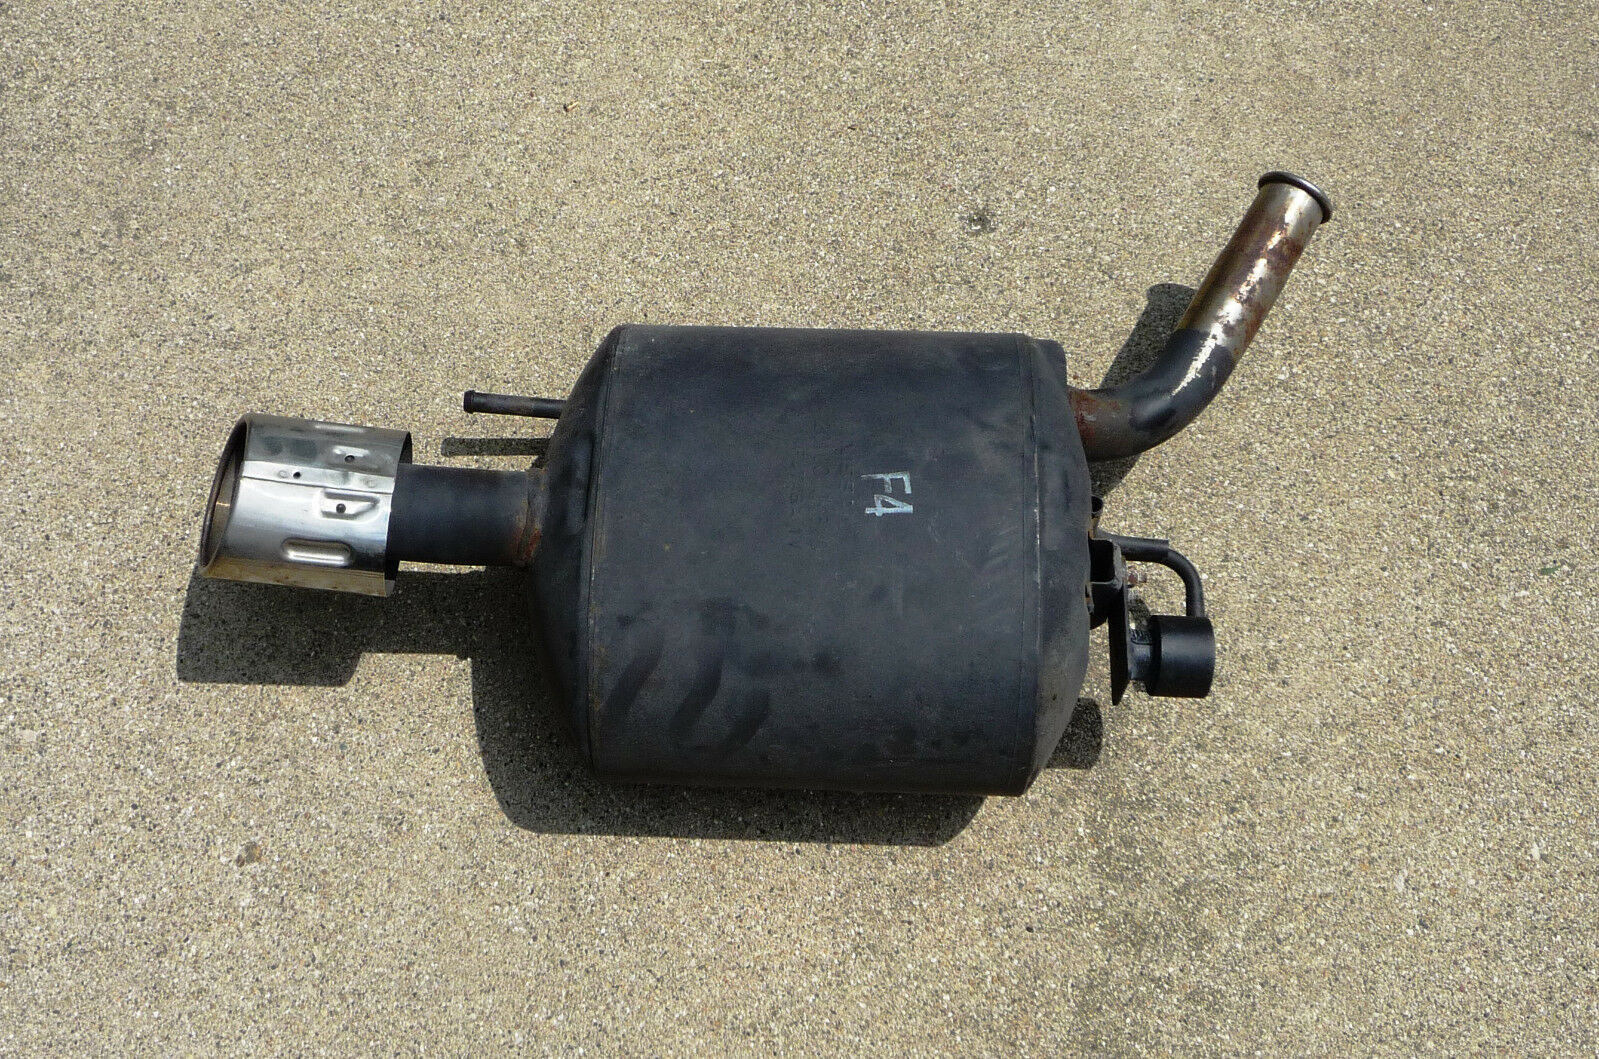 Used Infiniti G37 Exhaust Systems For Sale 2007 2013 Sedan Oem Left Driver Side Muffler G37s